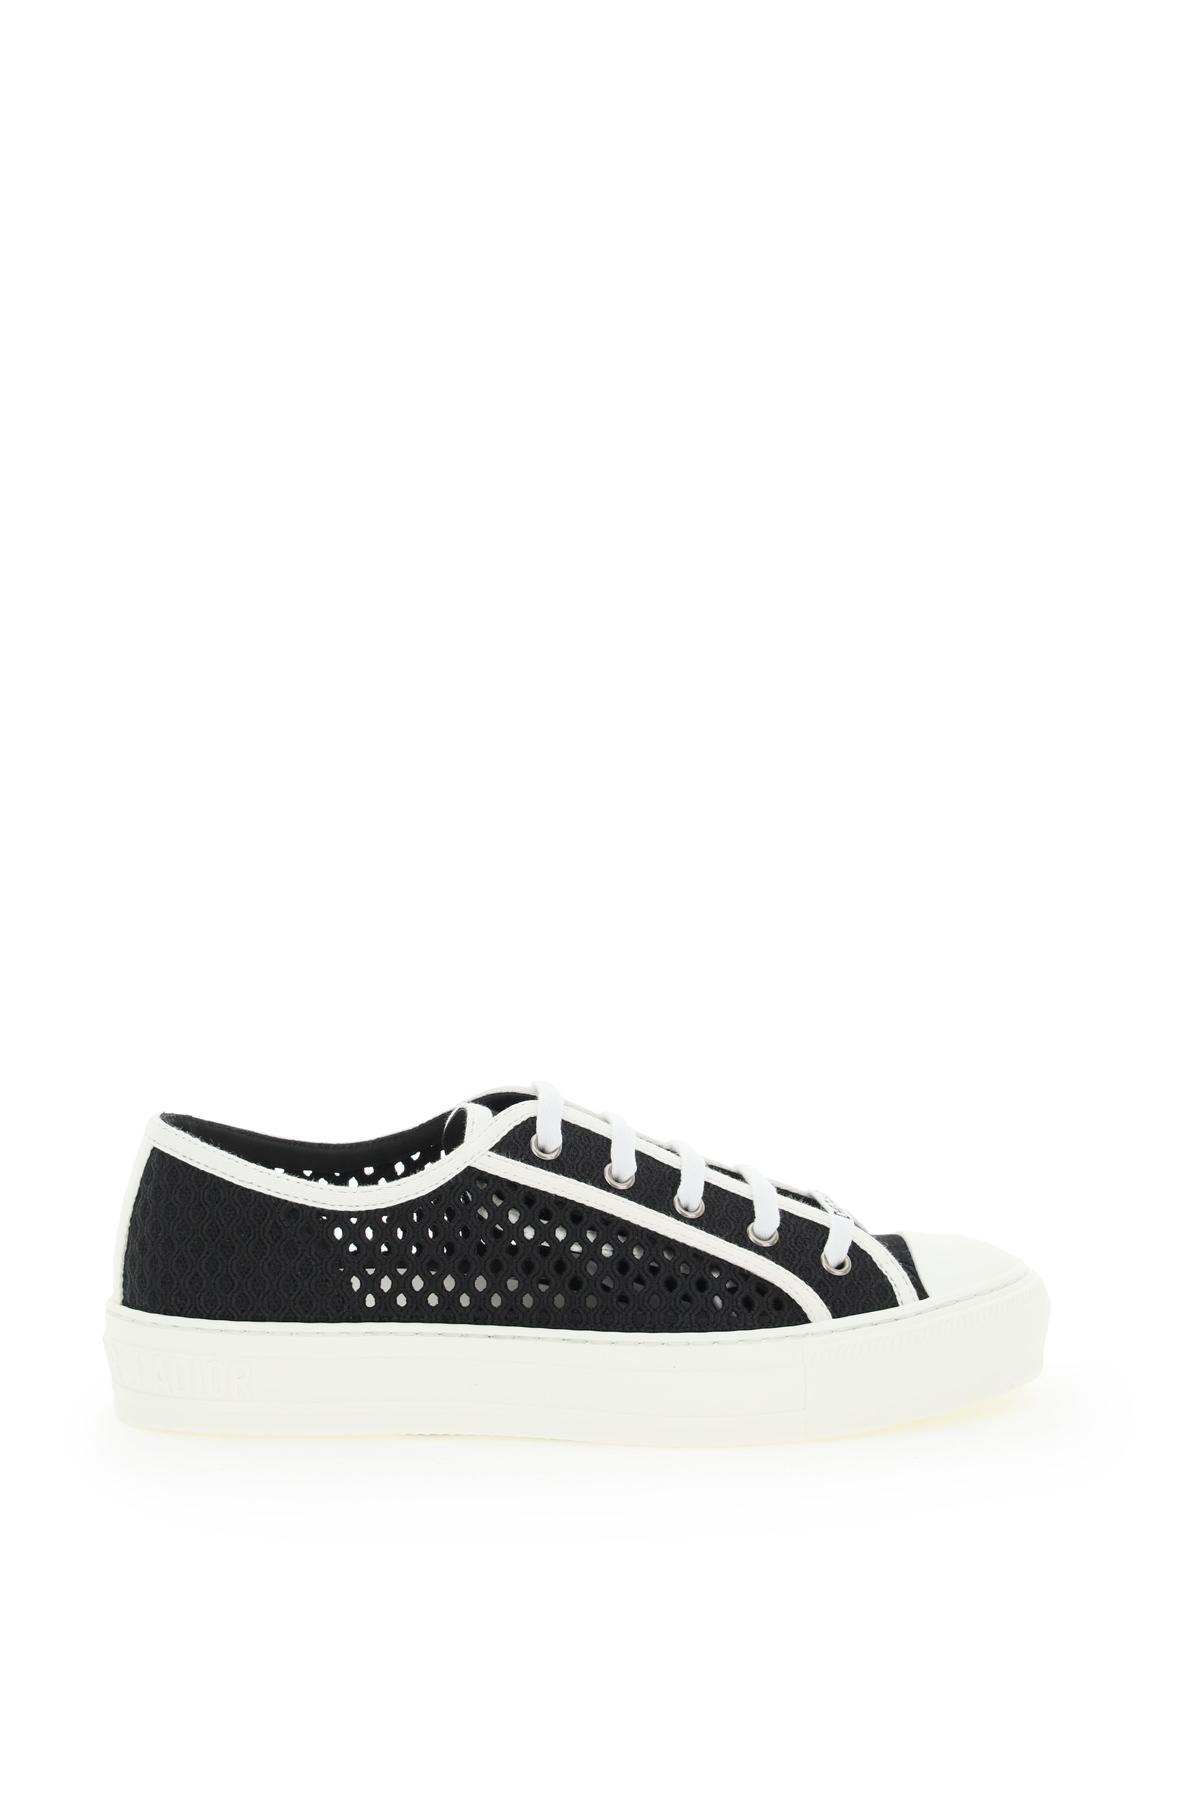 Dior sneakers ricamo rete walk'n'dior